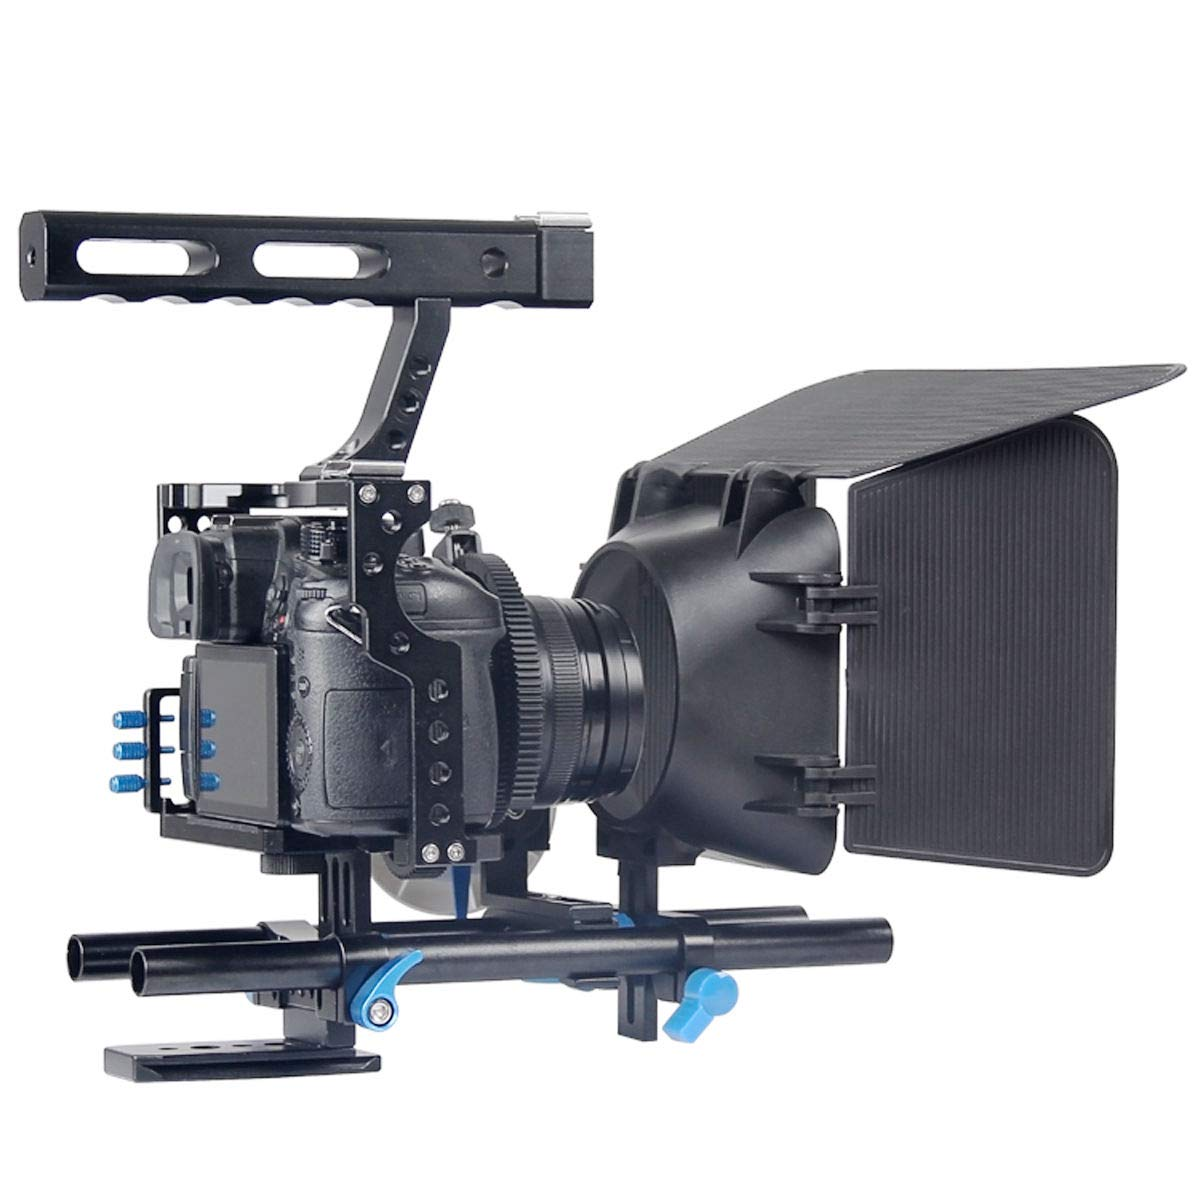 FidgetFidget Stabilizers for DSLR Camera Cage + Follow Focus + Matte Box Kit for Sony A7S A7 A7R A7RII A7SII by FidgetFidget (Image #3)